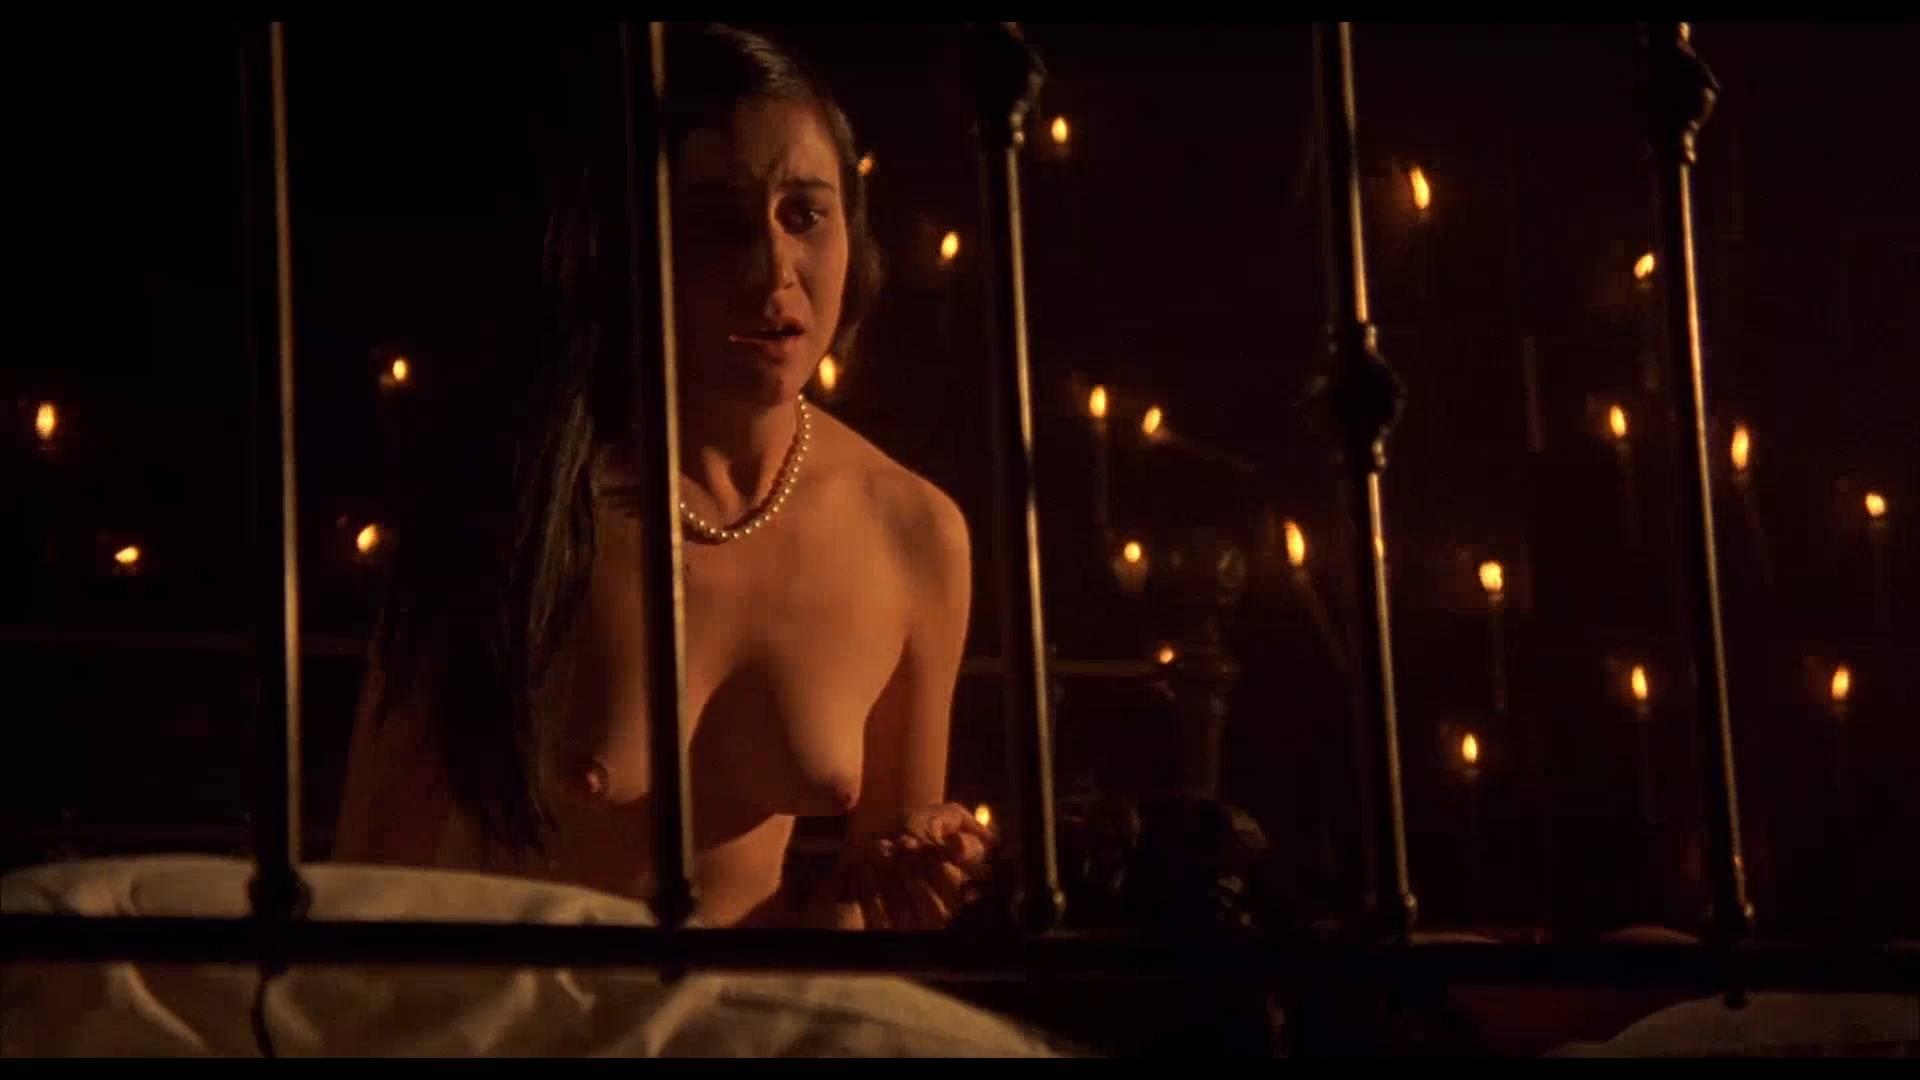 Lumi Cavazos nude full frontal Claudette Maille nude bush and Regina Torné nude topless - Como agua para chocolate (1992) 1080p (3)